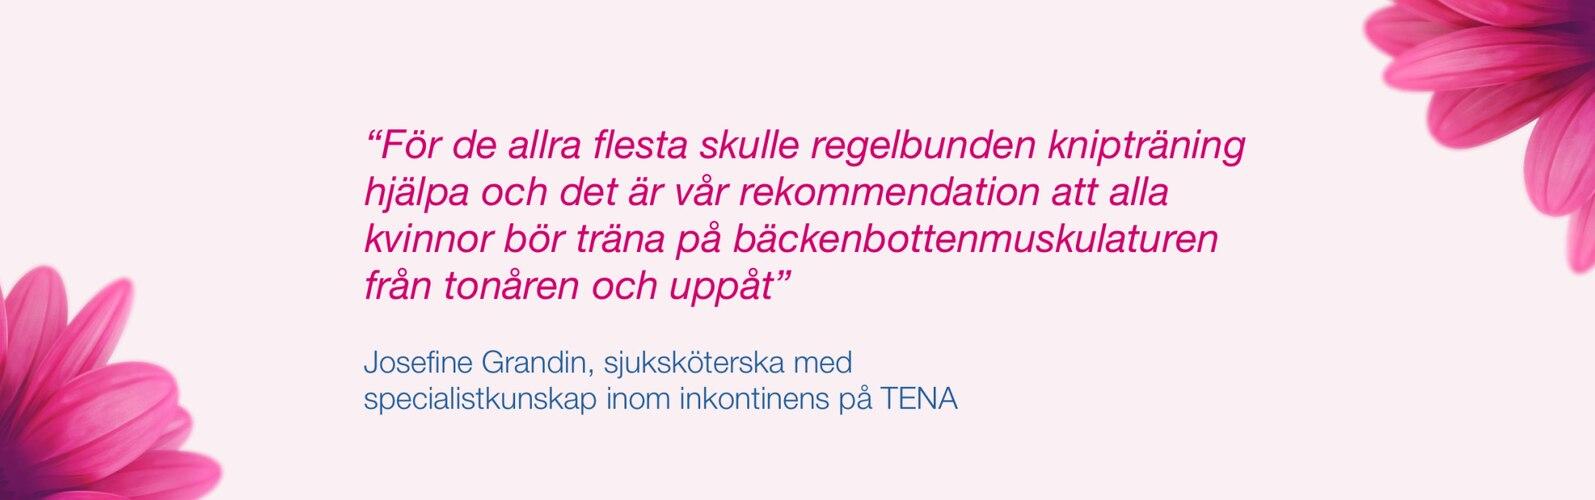 Citat från uroterapeuten Josefine Grandin